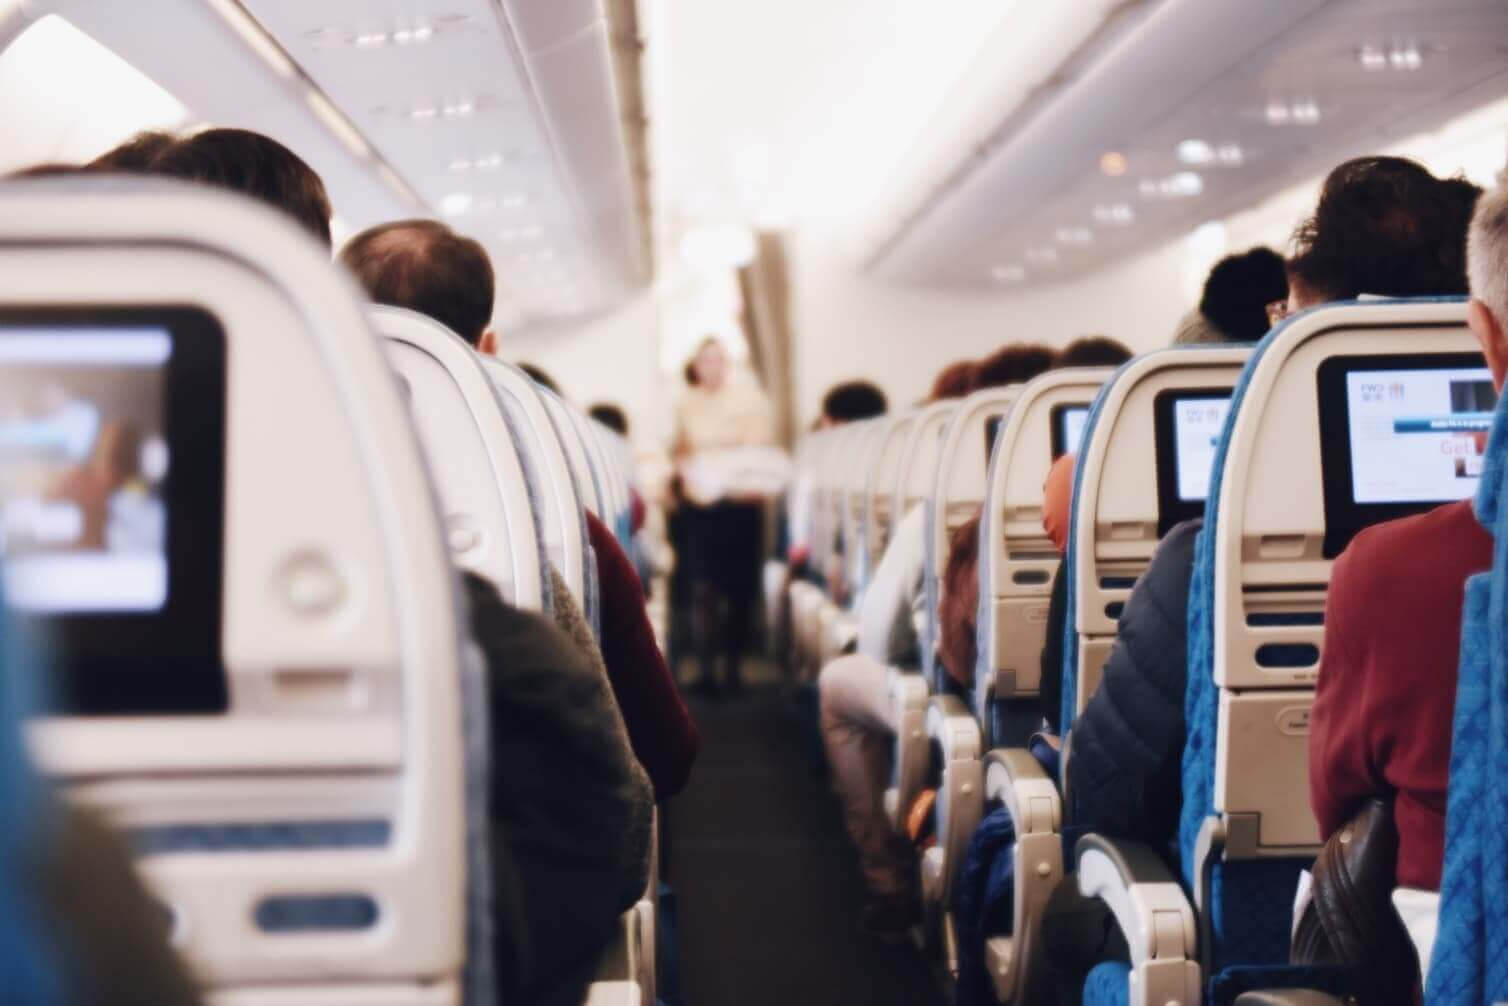 Short Film Business Plan - Airplane - StudioBinder